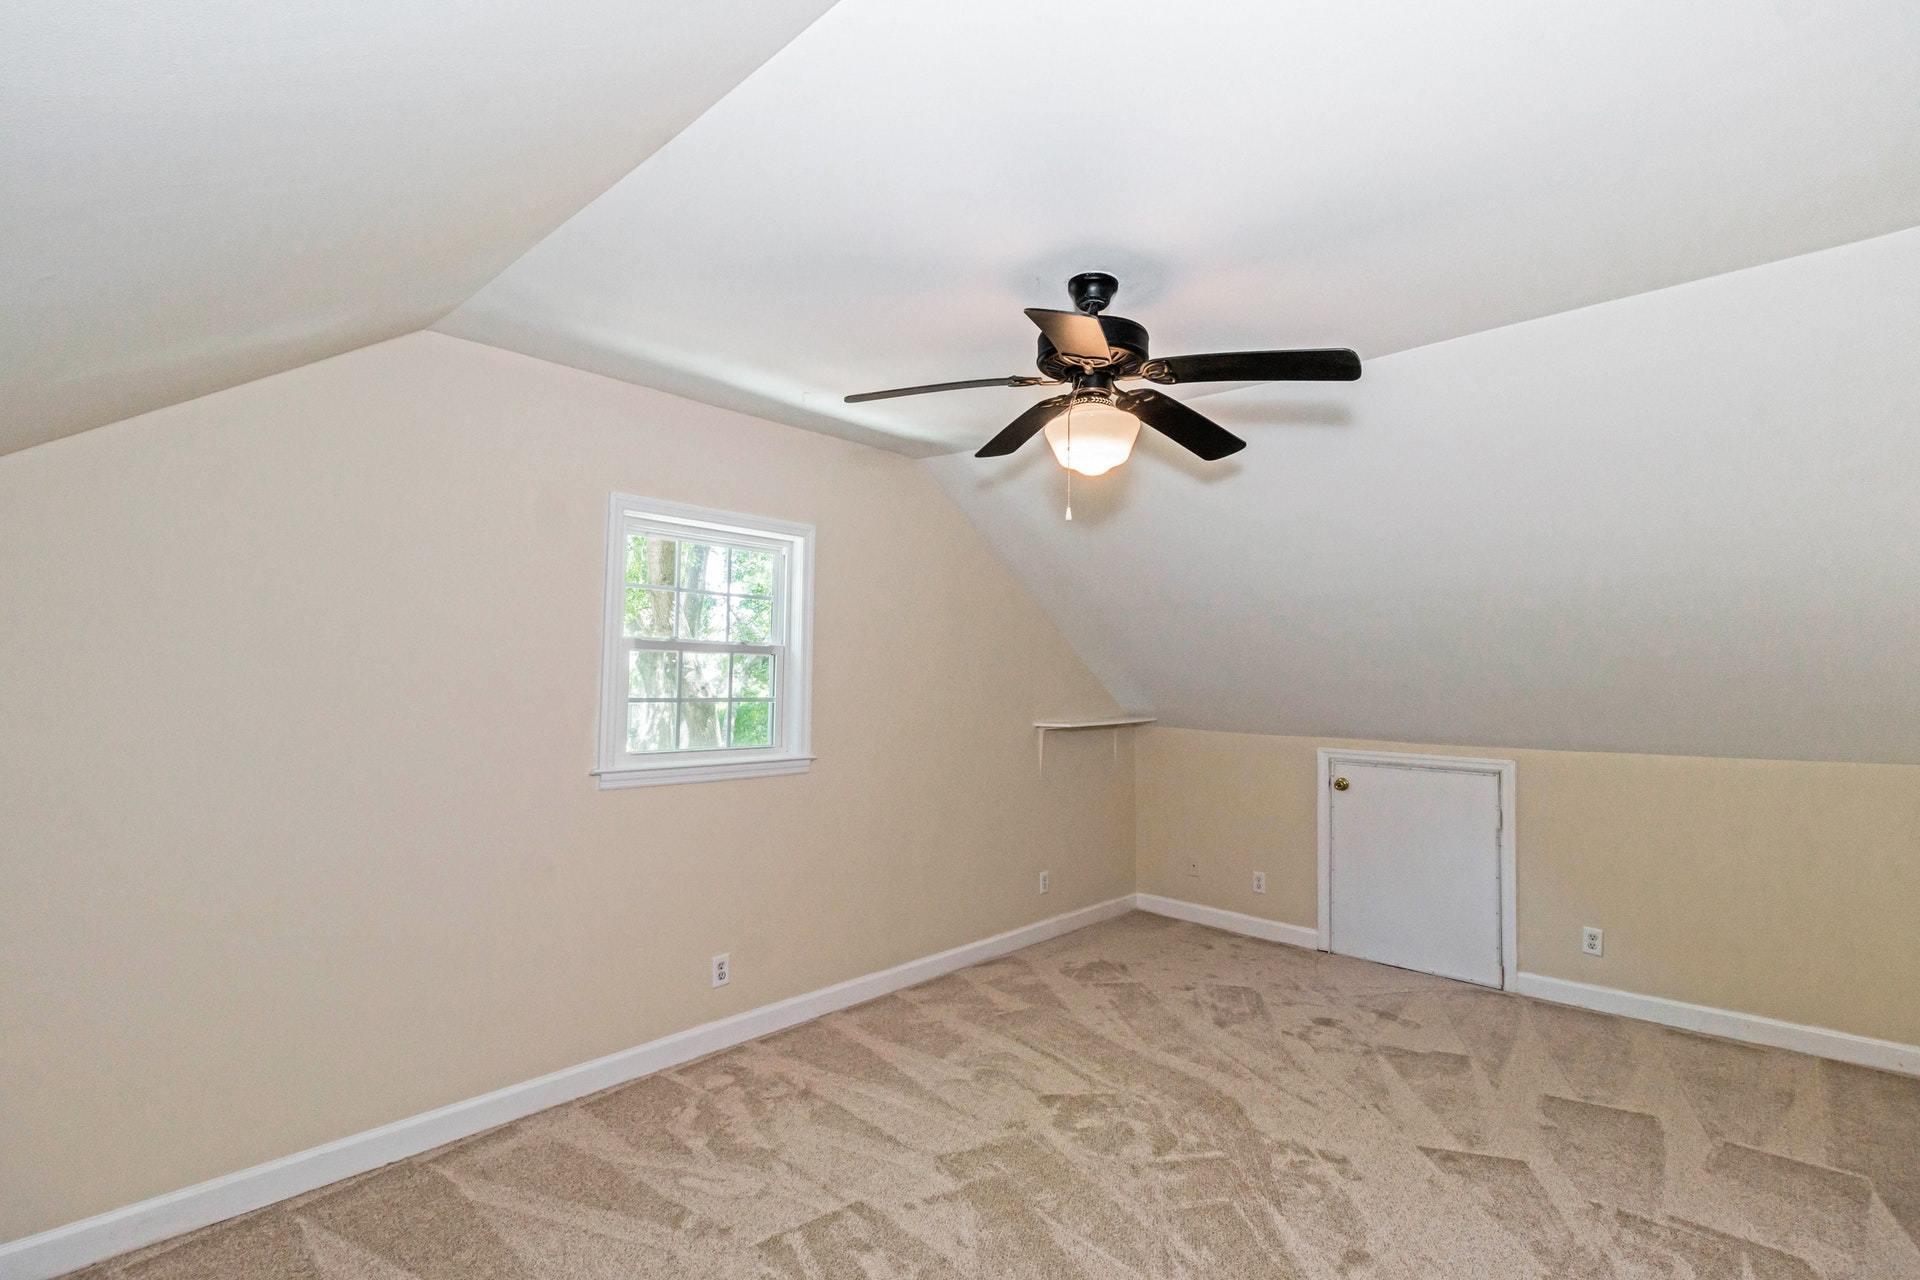 Shemwood II Homes For Sale - 969 Sea Gull, Mount Pleasant, SC - 5